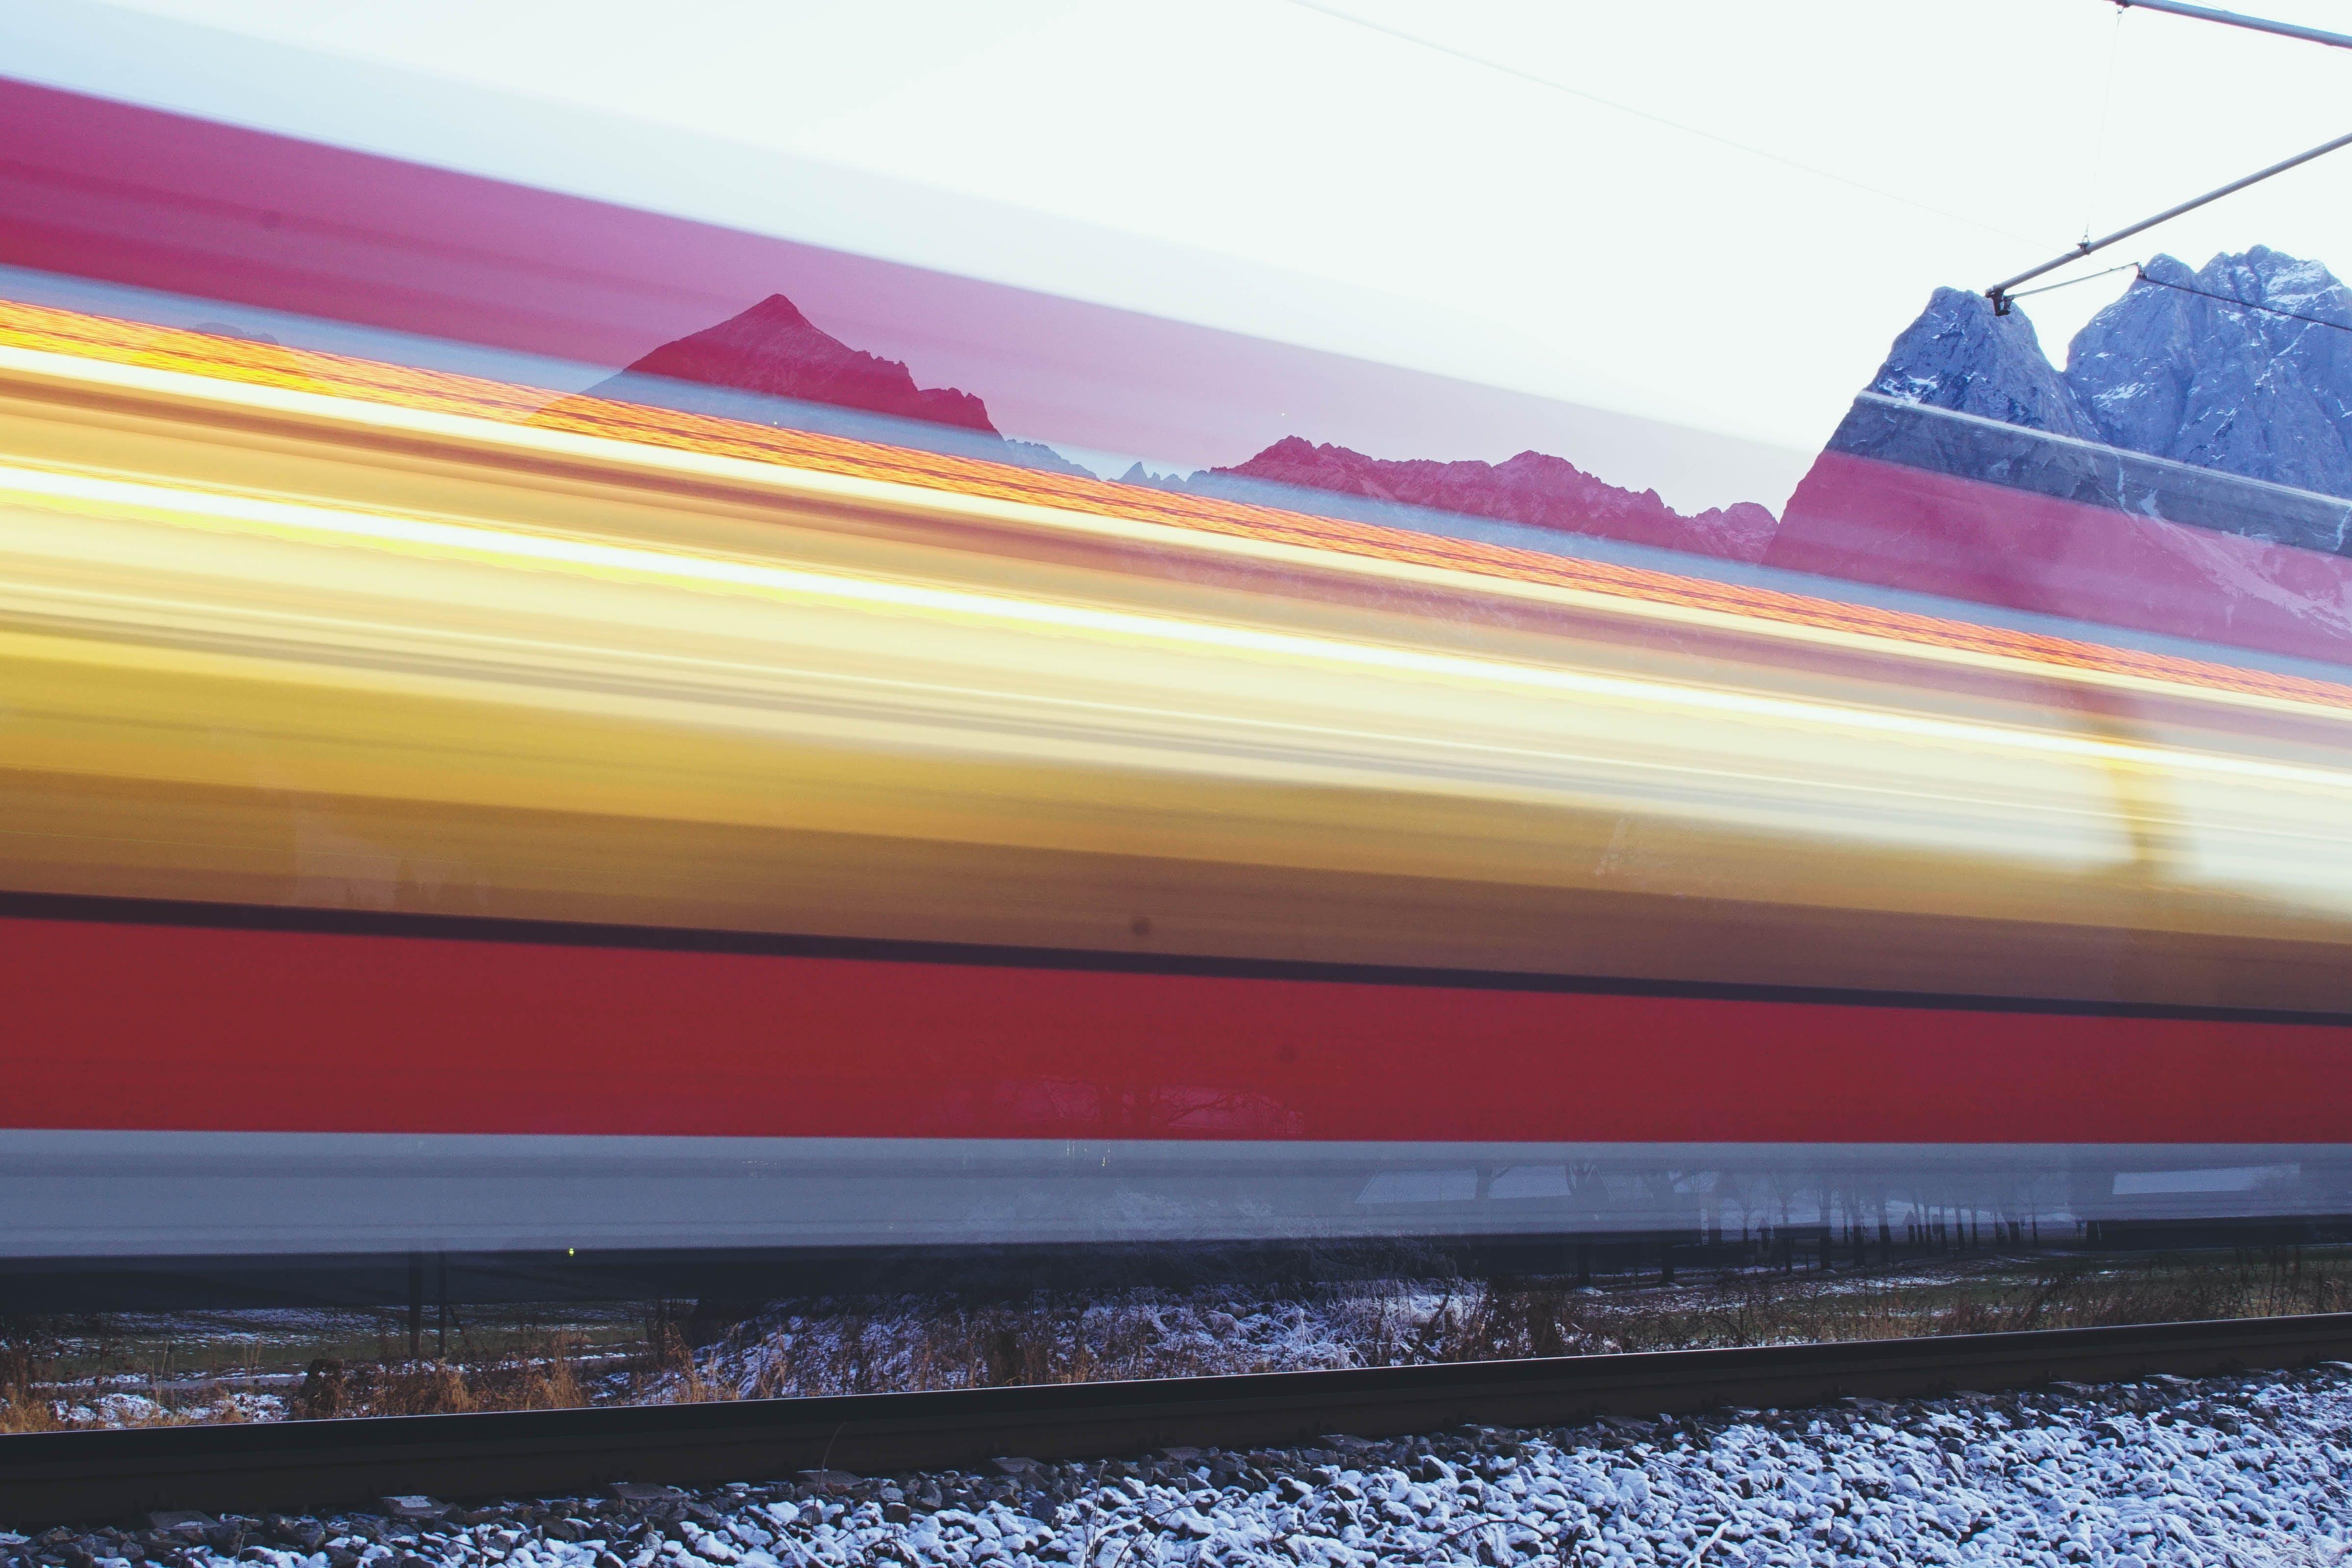 art, Bavaria, blur